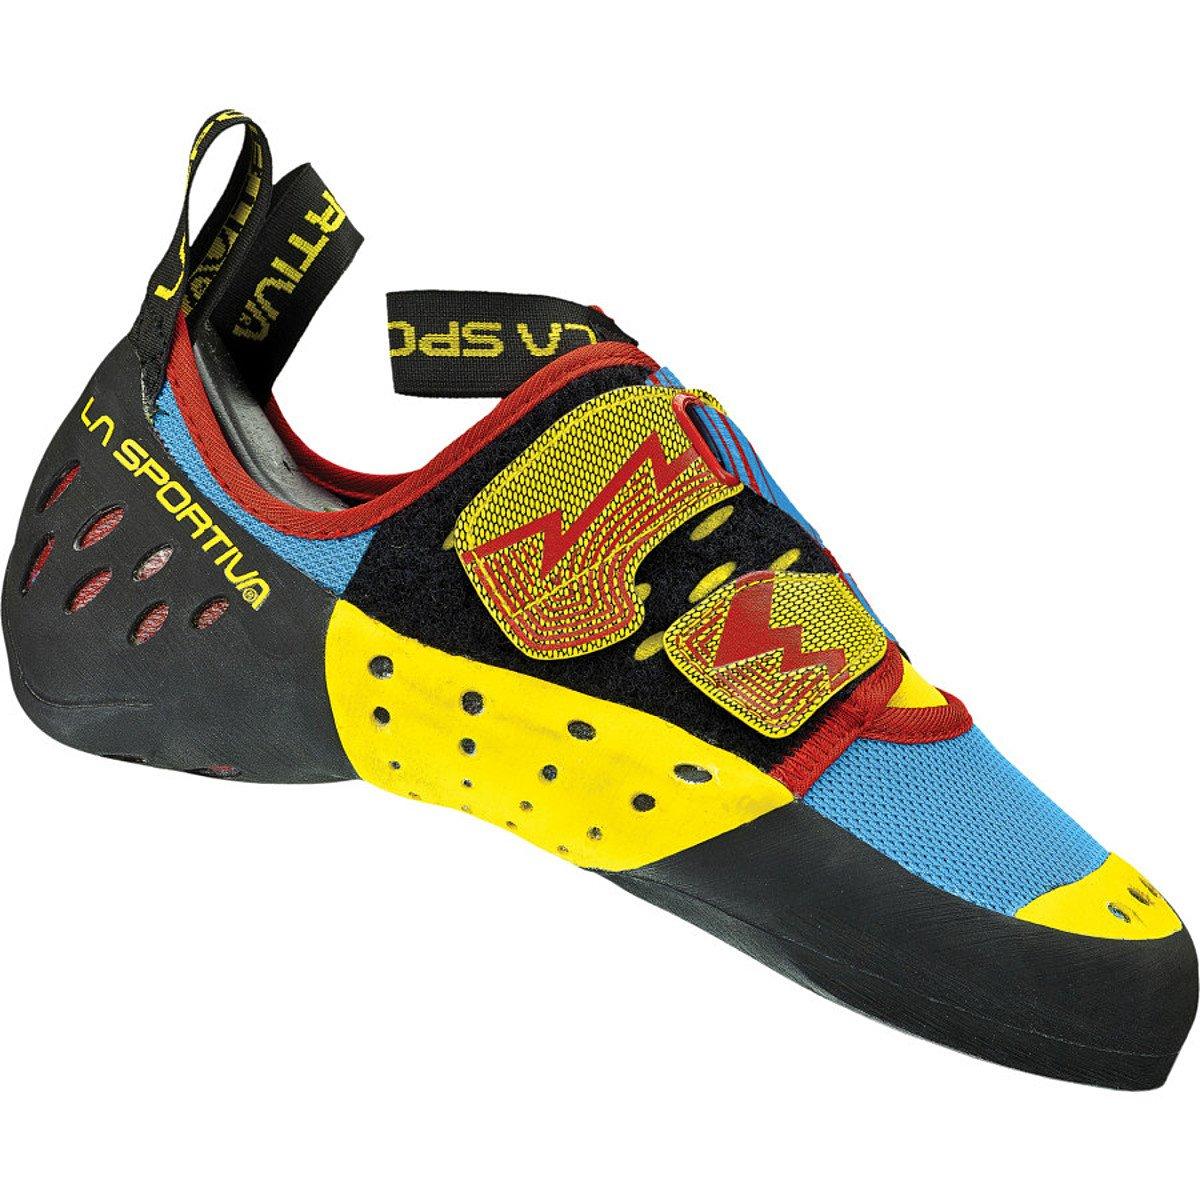 Oxygym Climbing Shoe - Men39;s